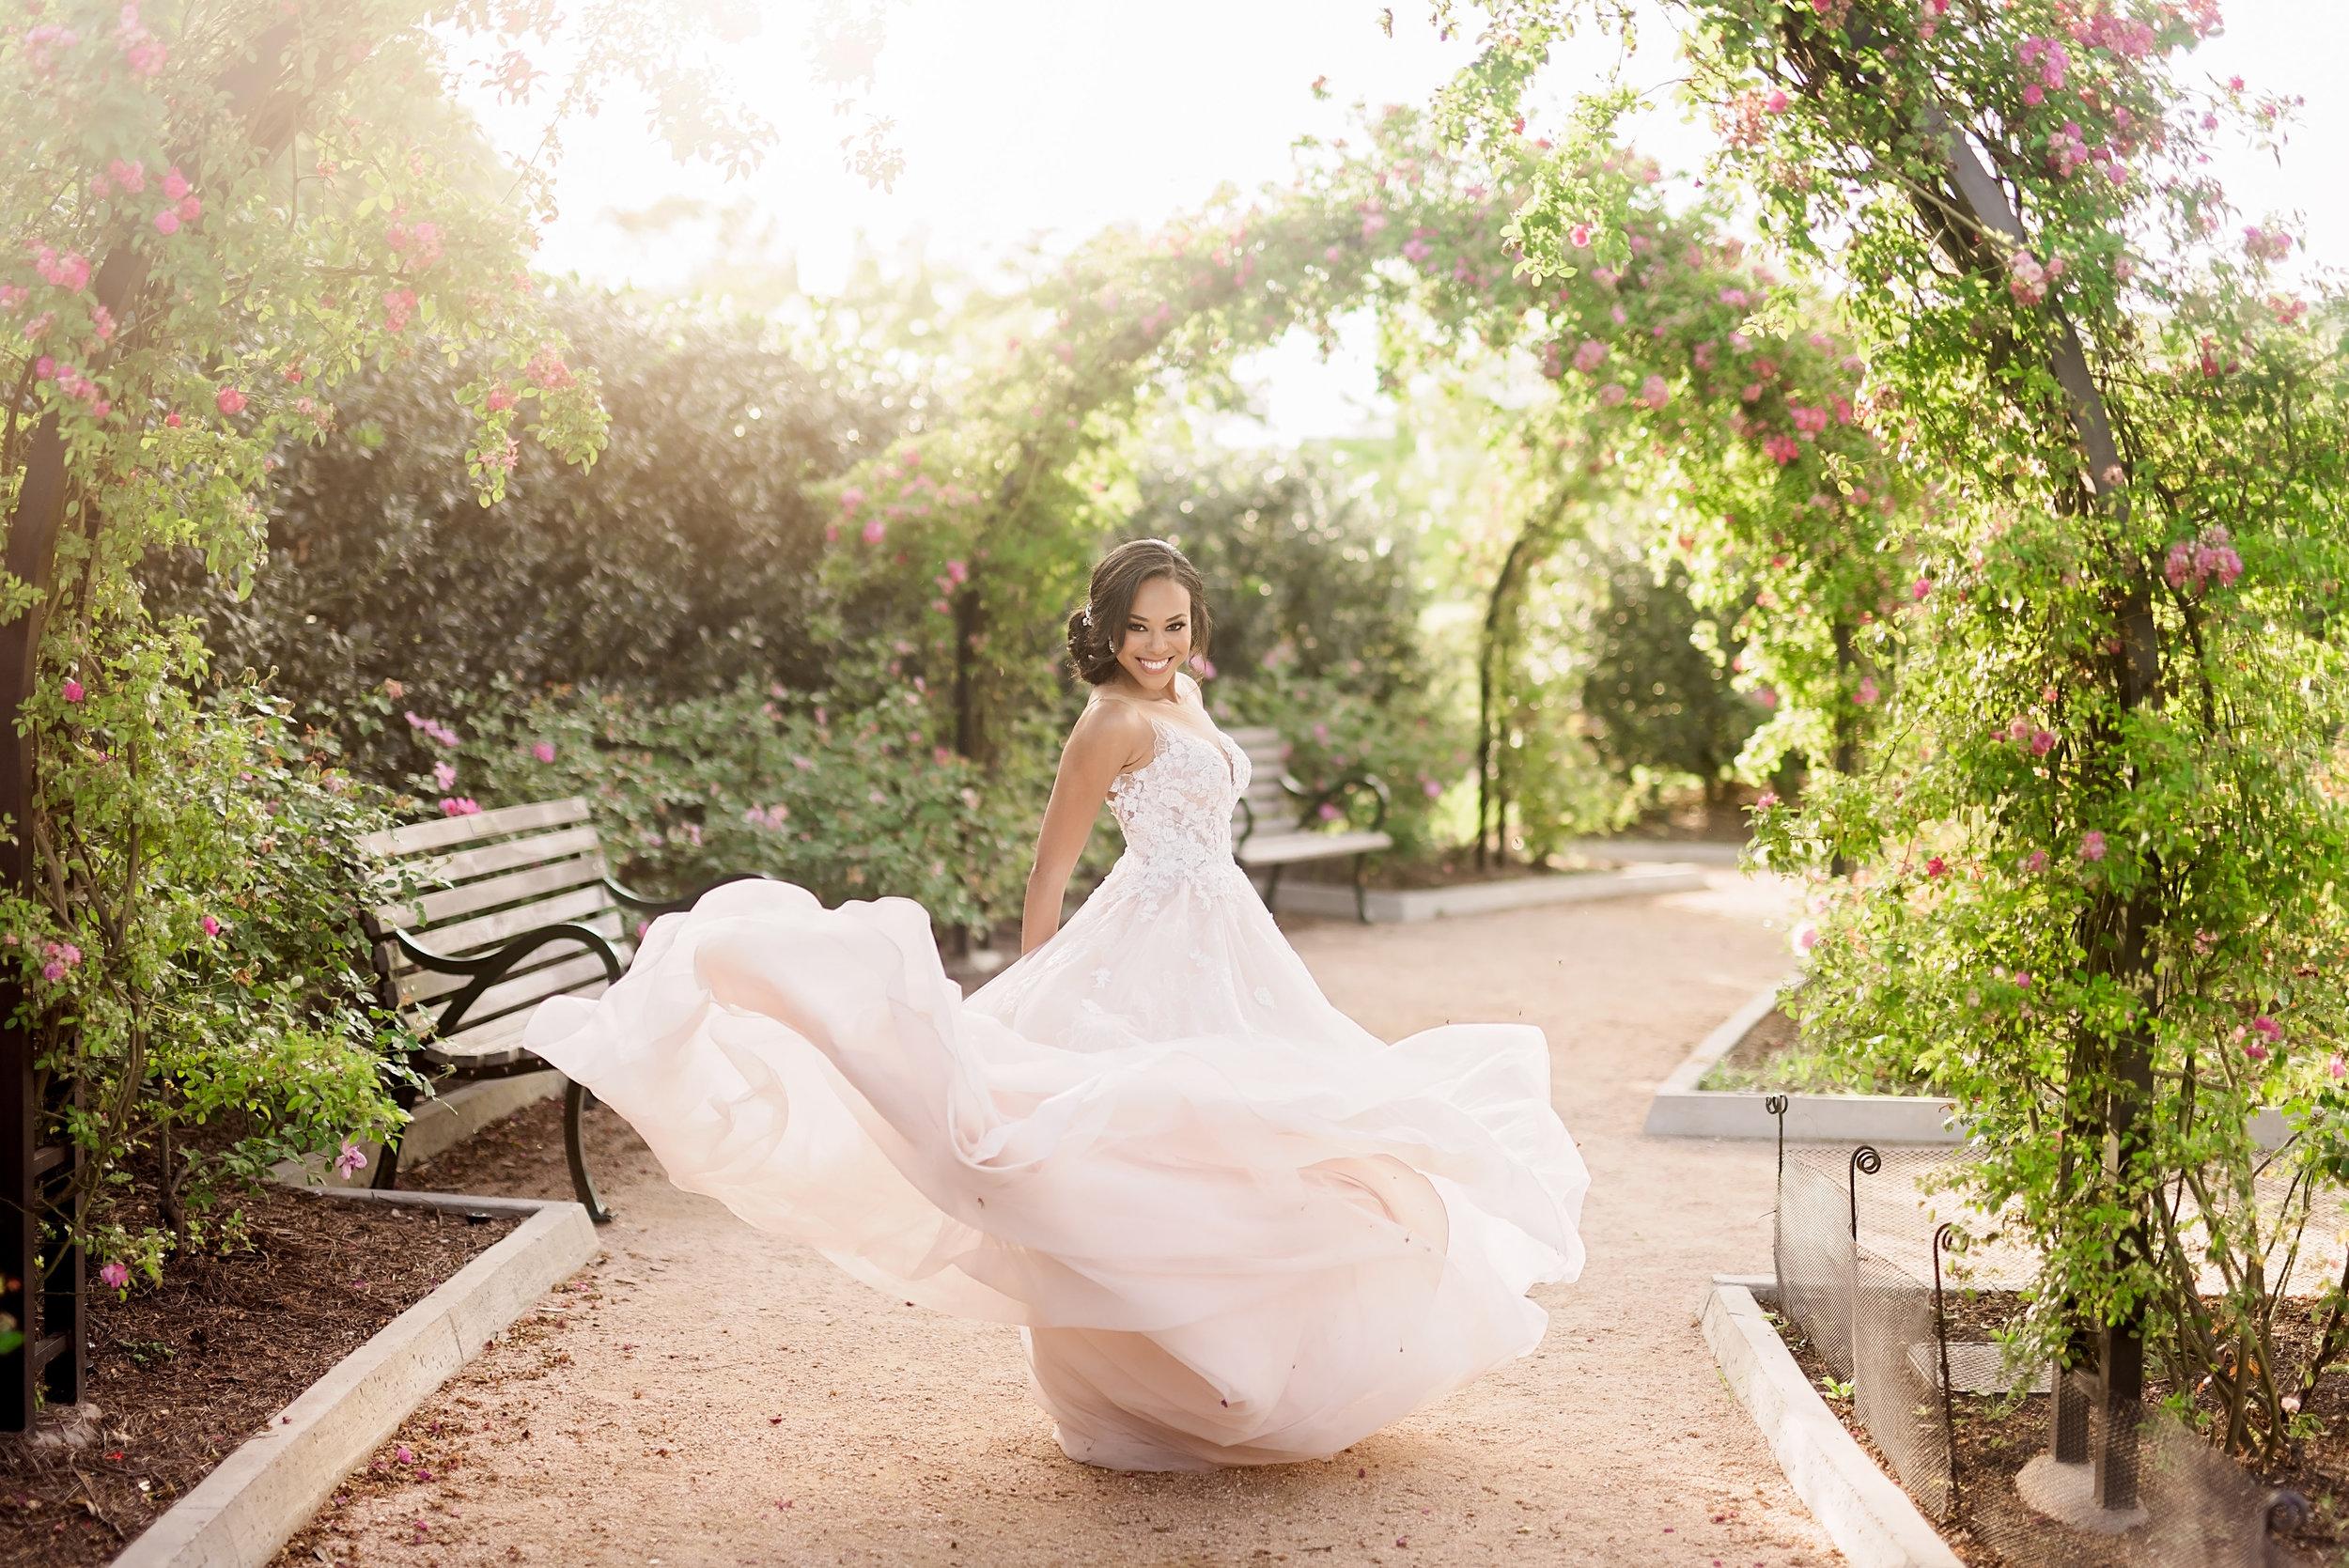 Taylor-bridal-Pharris-Photography-68.jpg